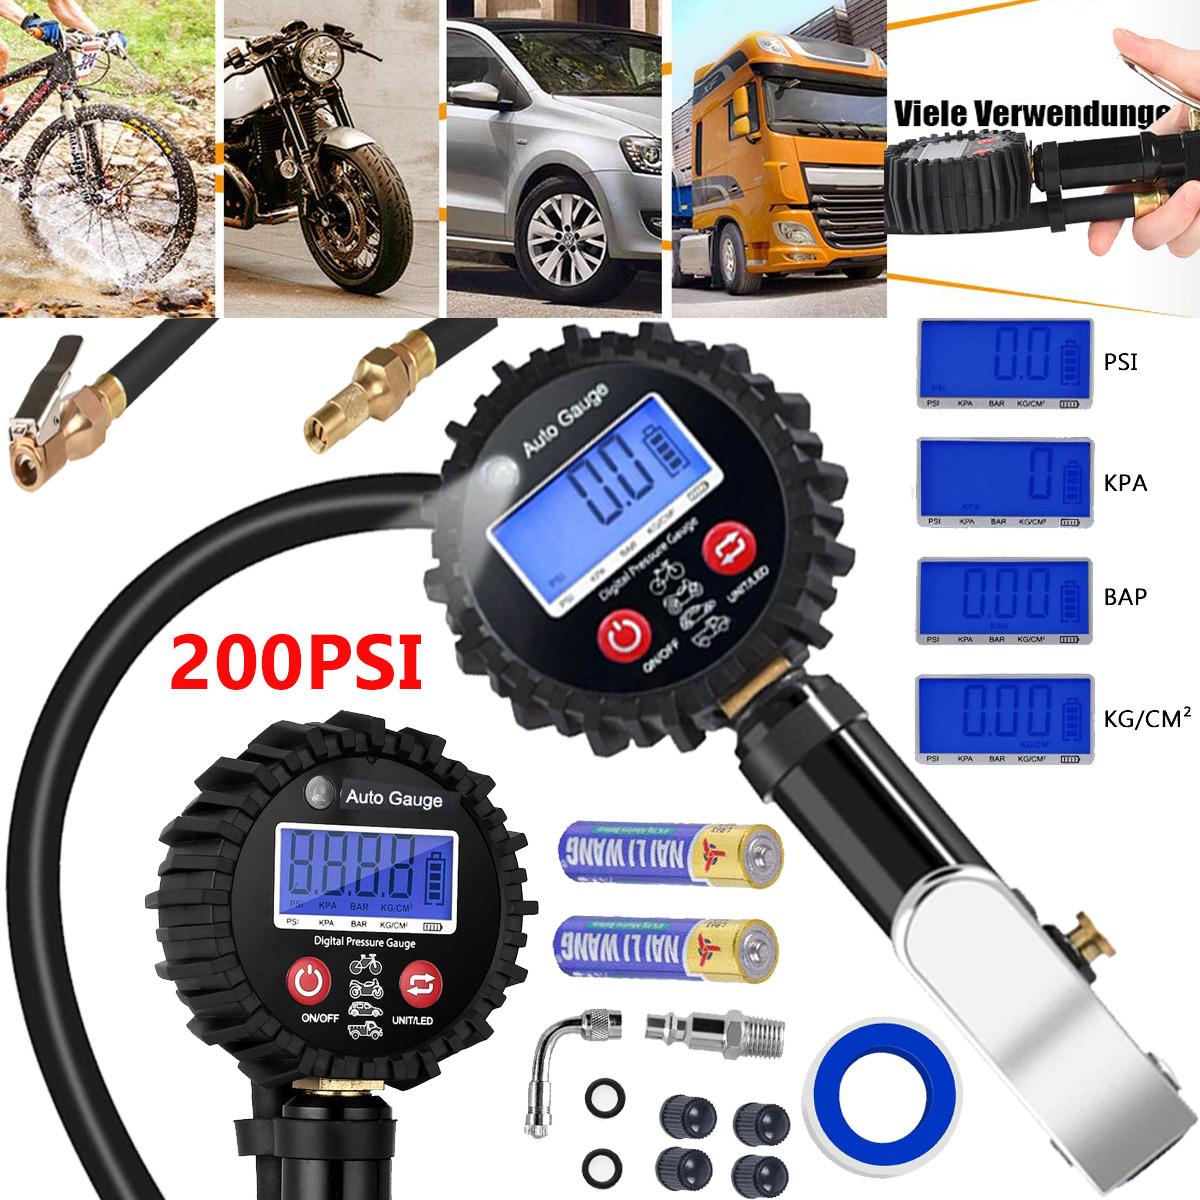 Digital Reifen Druckmesser Tester Manometer Auto Truck Motorrad 0-200PSI Schwarz